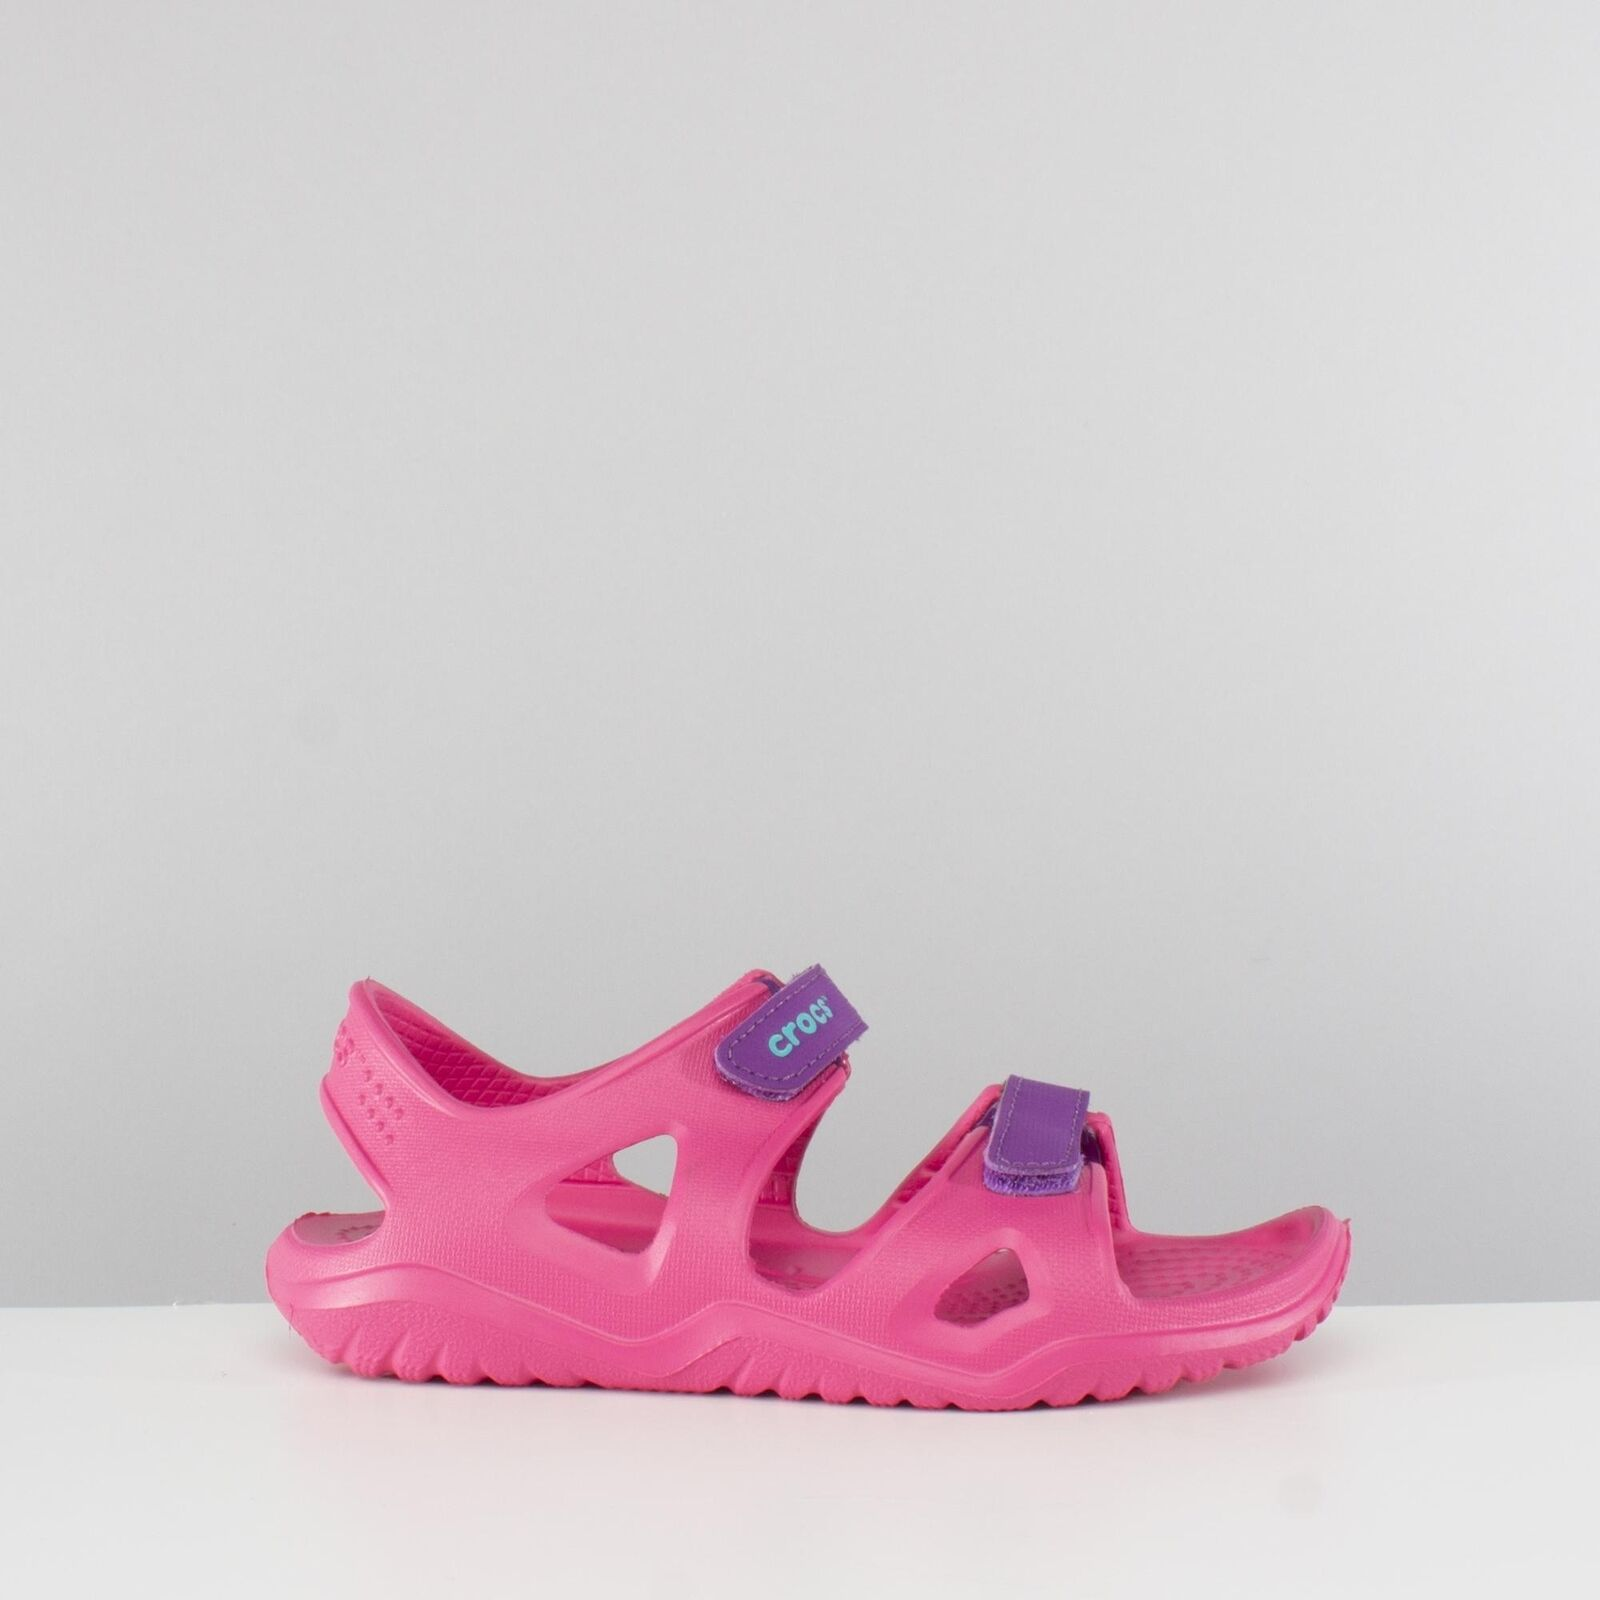 393f16dbf864 Crocs Unisex Kids Swiftwater River Open Toe Sandals Pink Summer ...